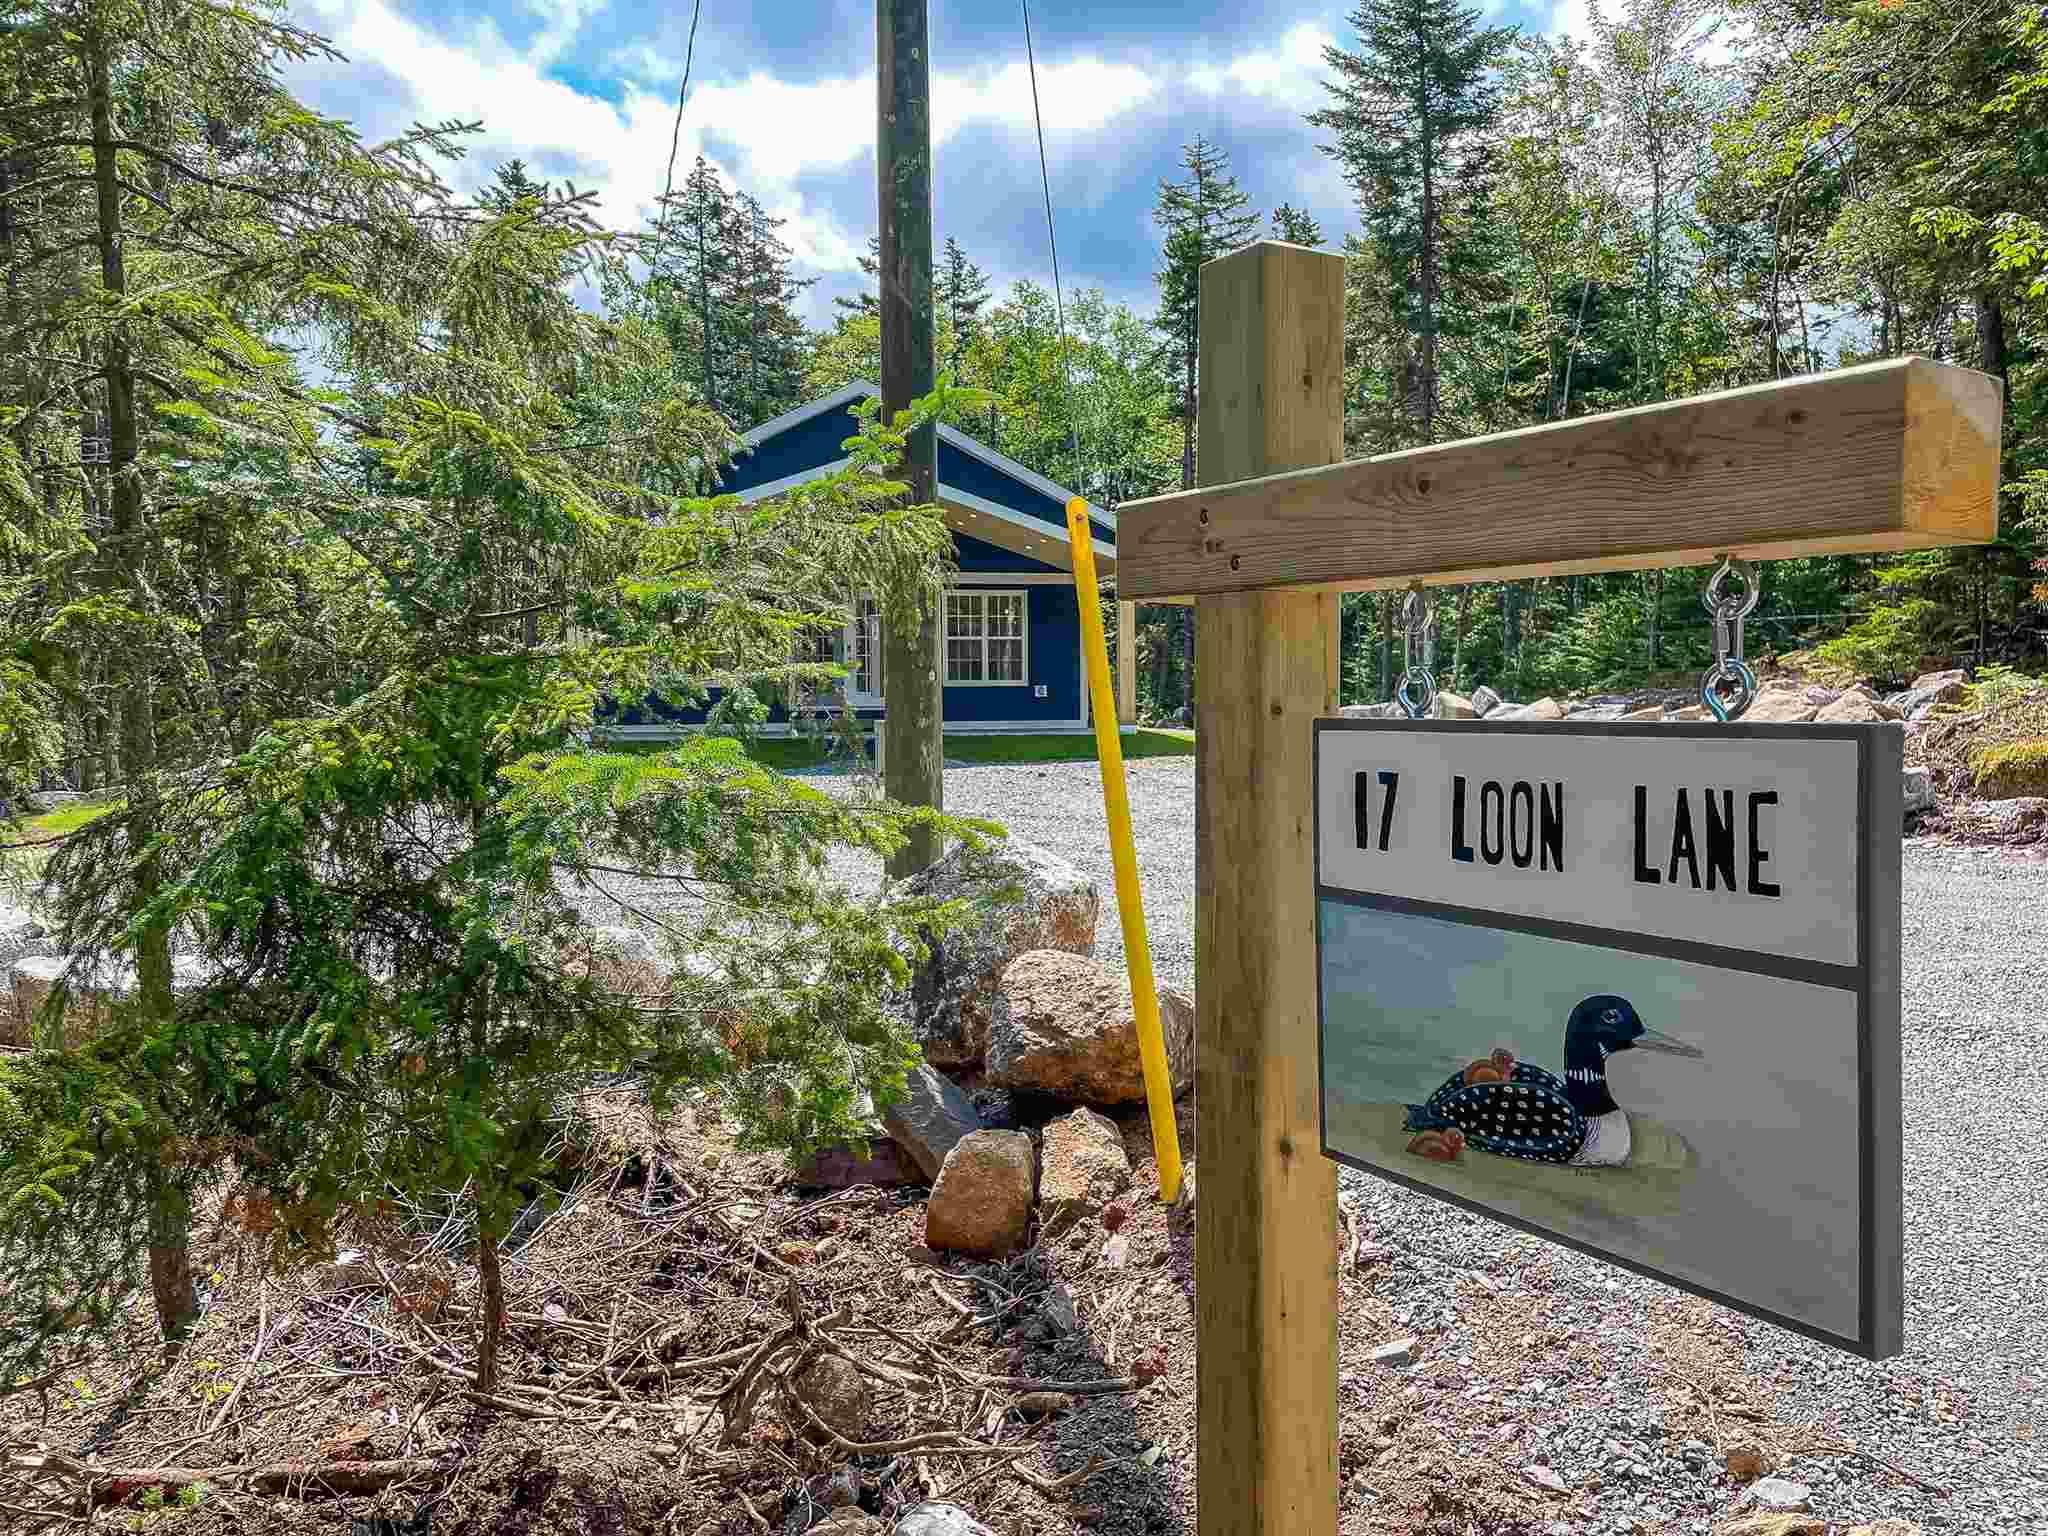 17 Loon Lane, Aylesford, Nova Scotia, Canada